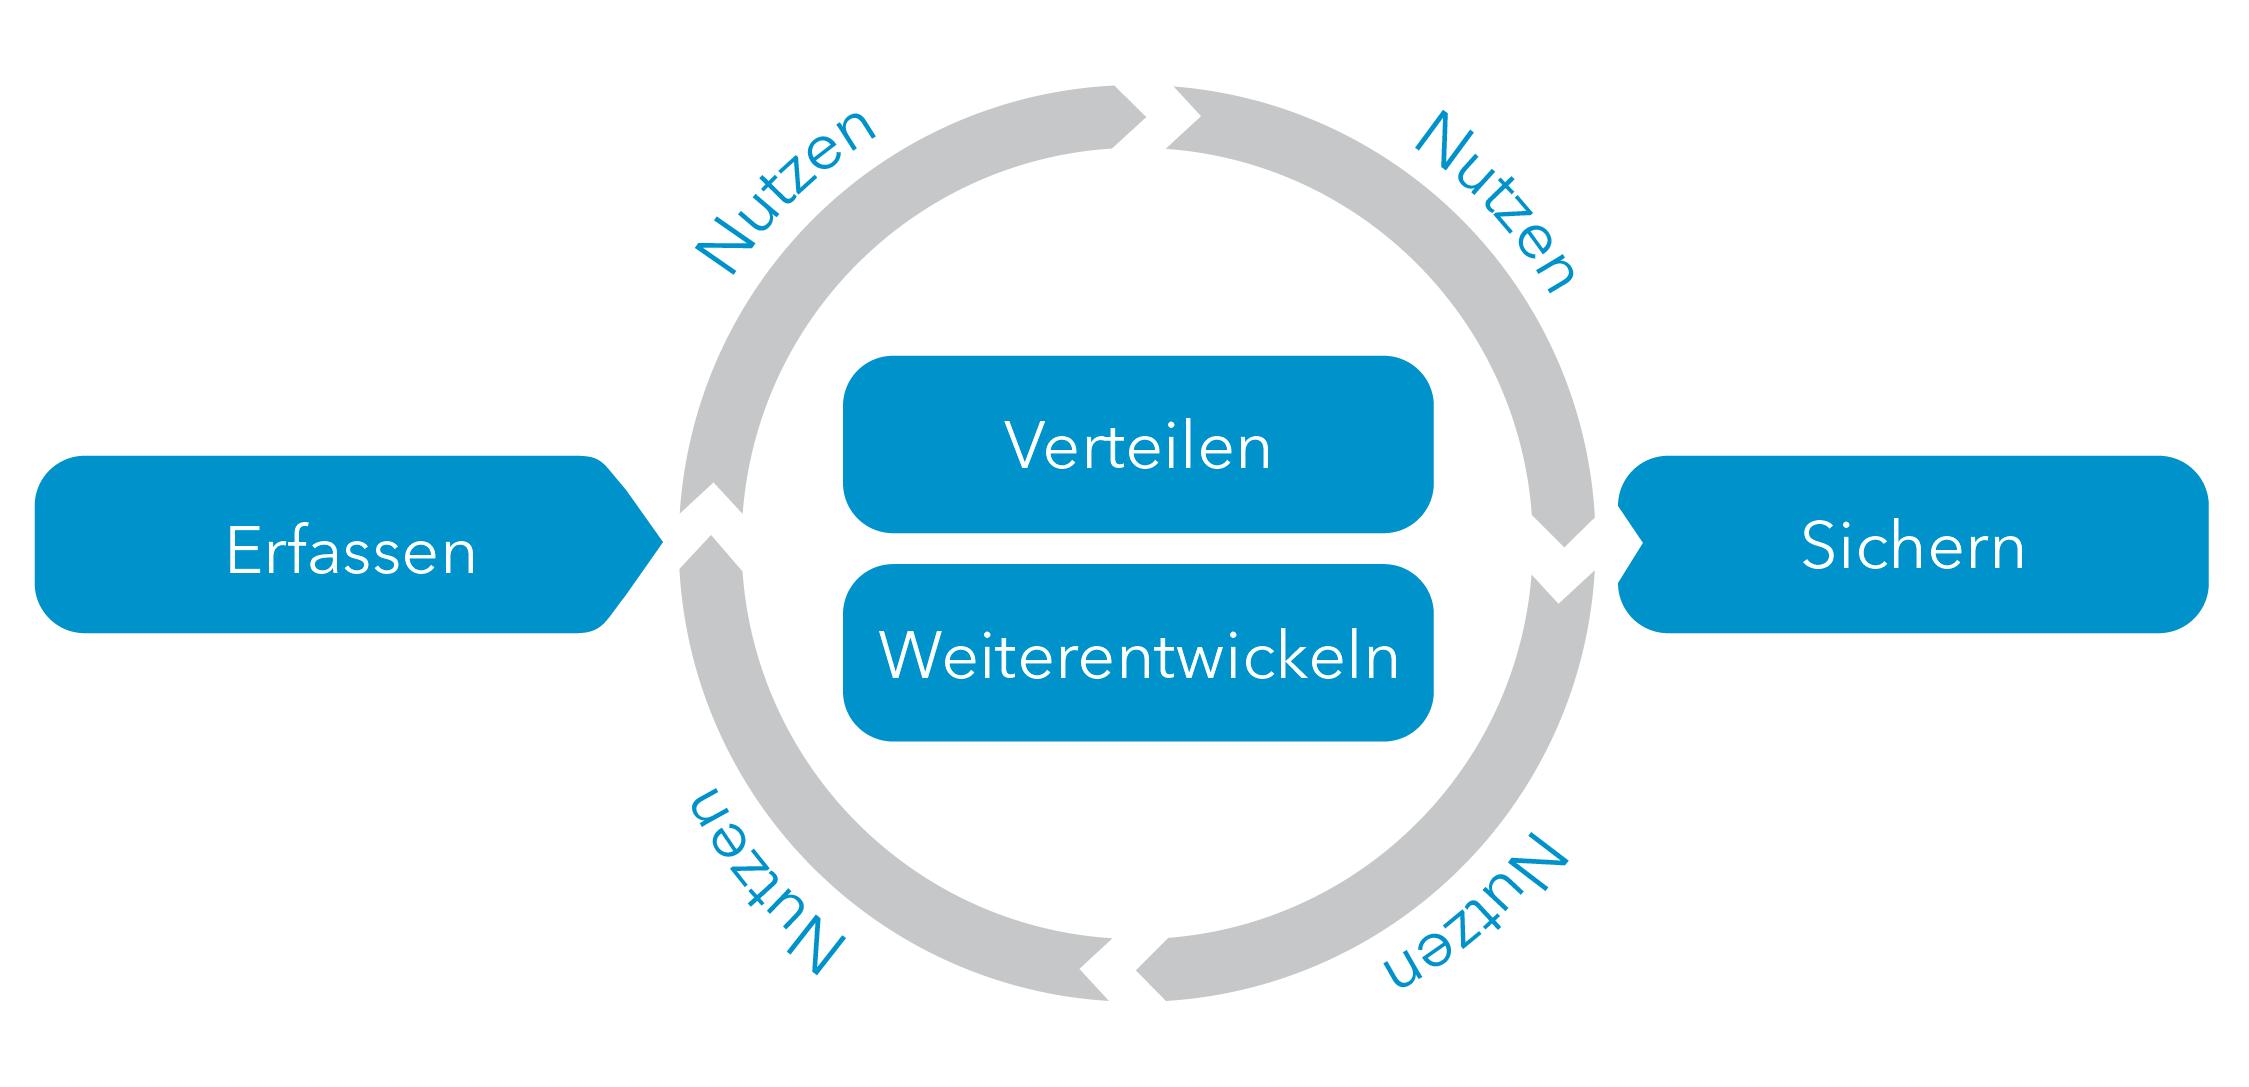 WBI-Prozess-komplett-05